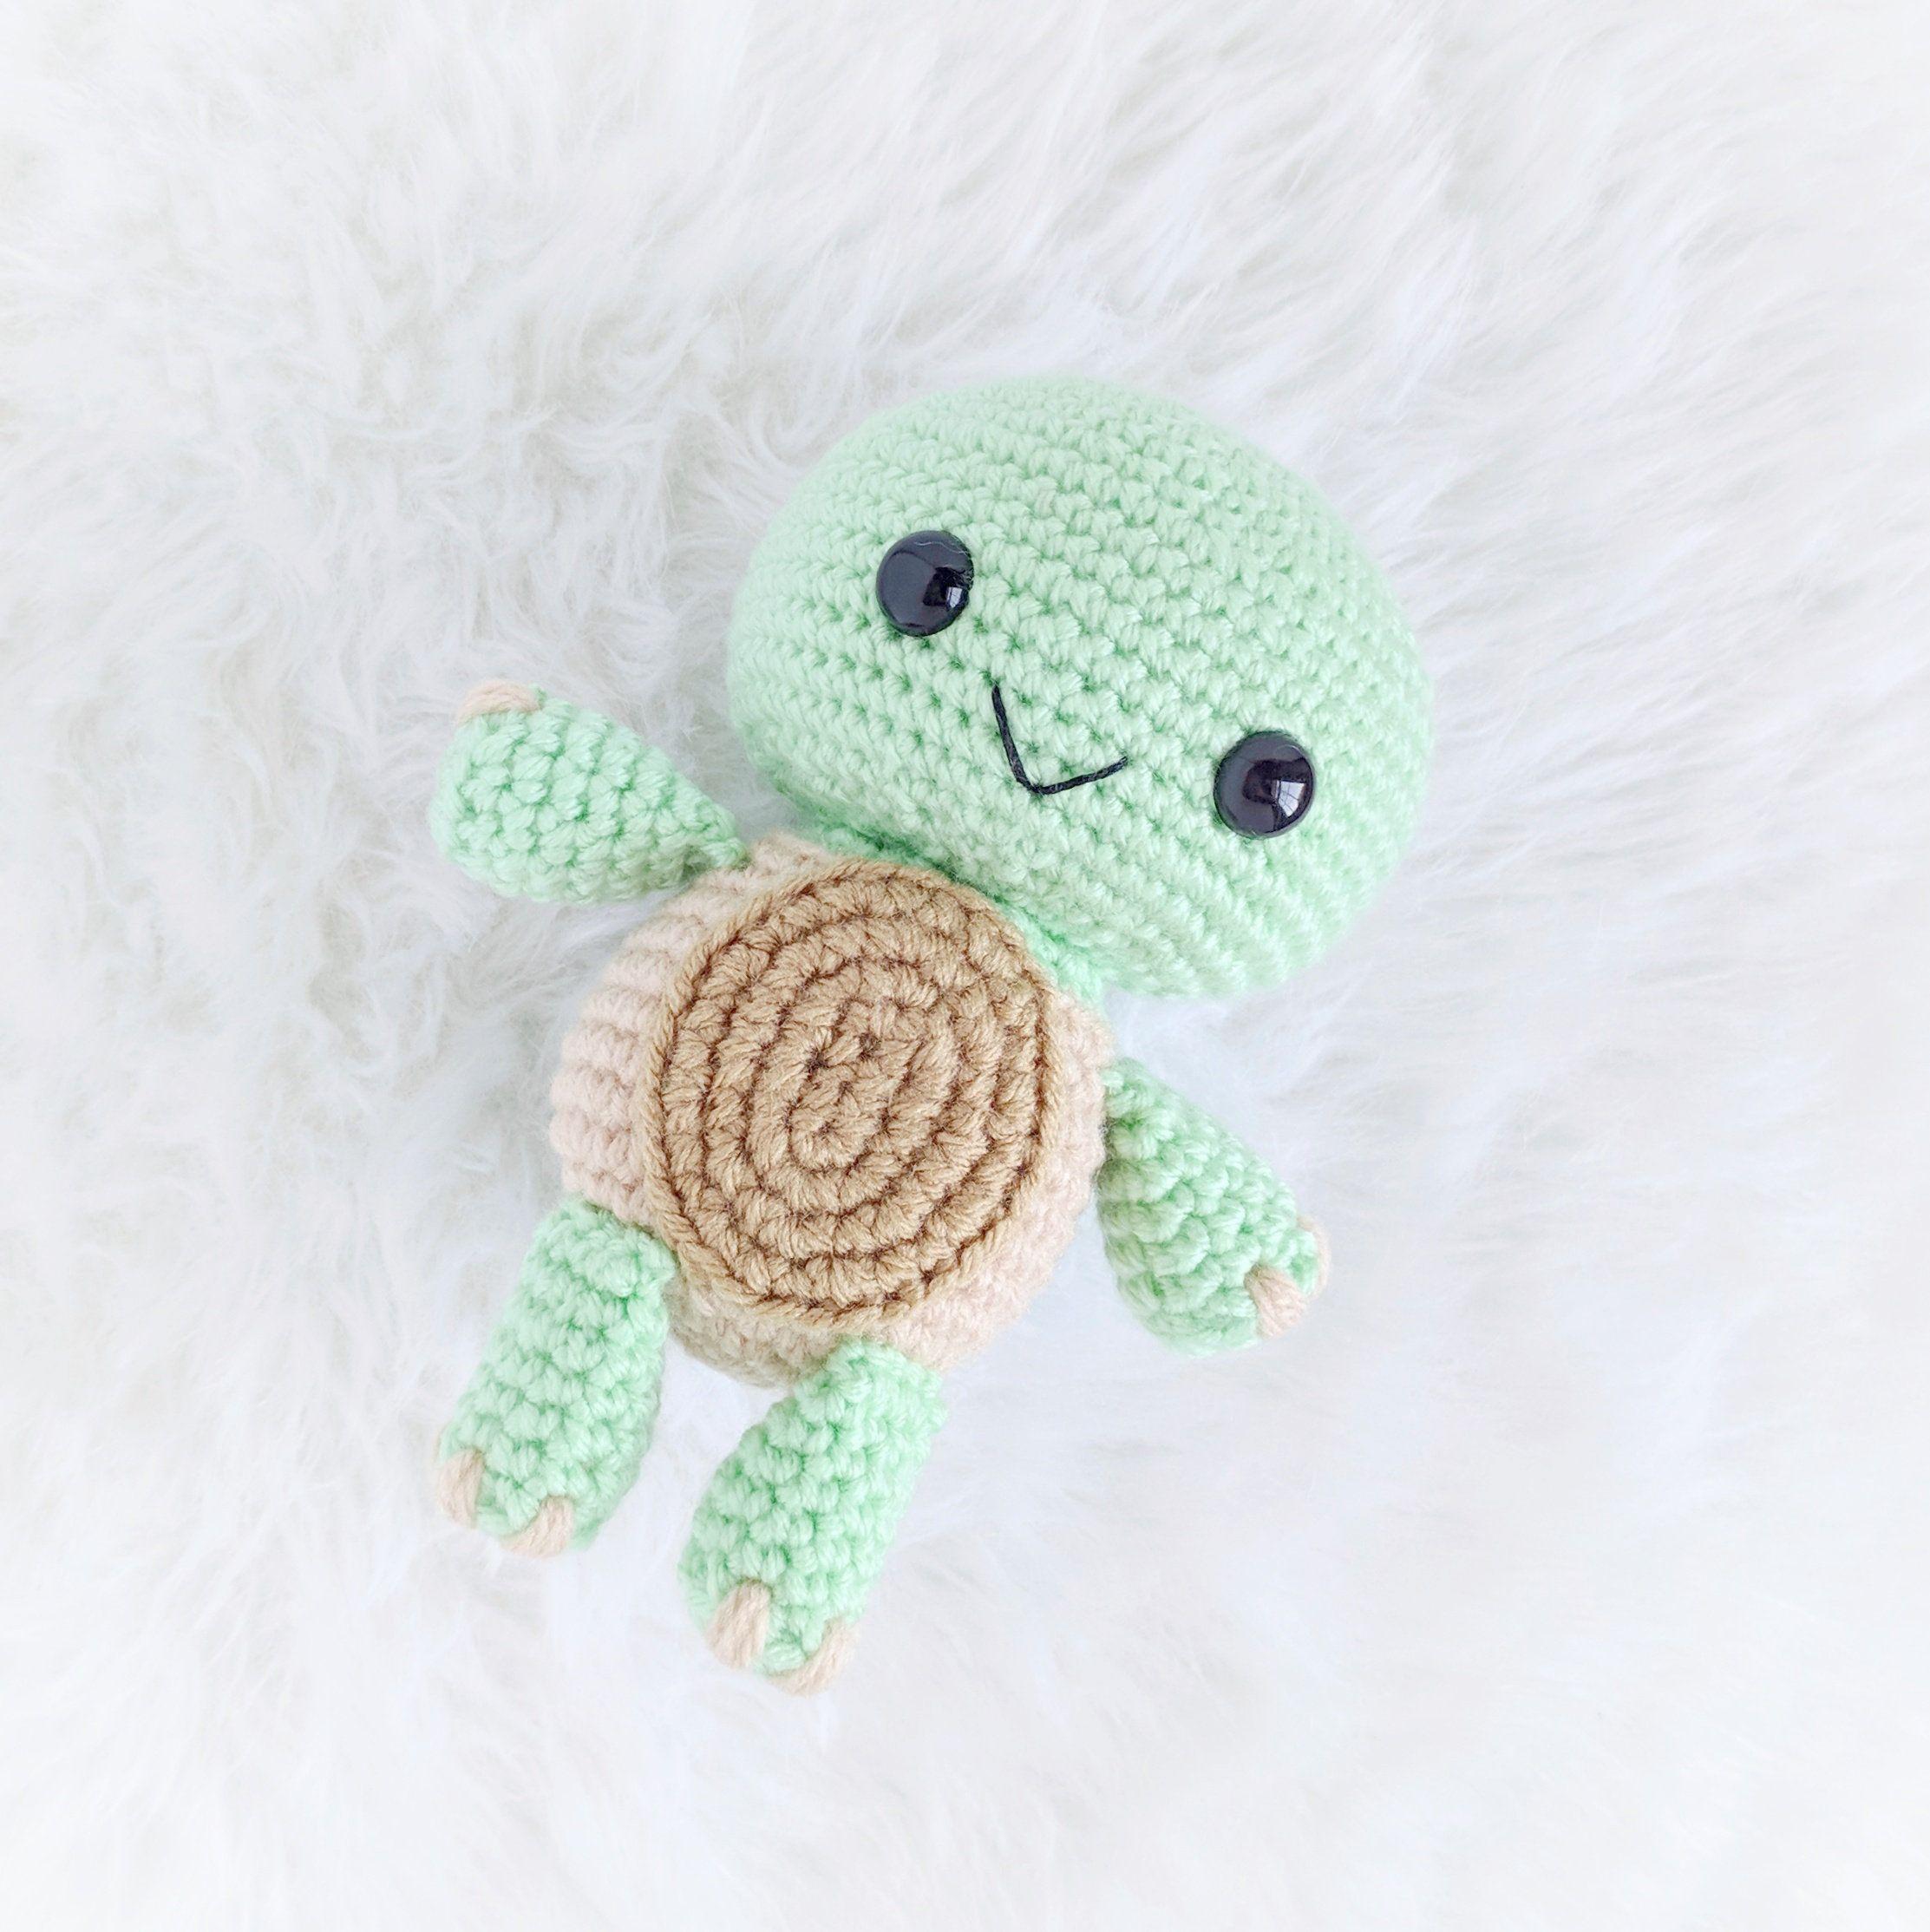 Pattern: Crochet Turtle Pattern, Amigurumi Turtle Pattern, Crocheted Turtle, Amigurumi Tortoise, Baby Turtle, Turtle Toy, Stuffed Turtle #crochetturtles